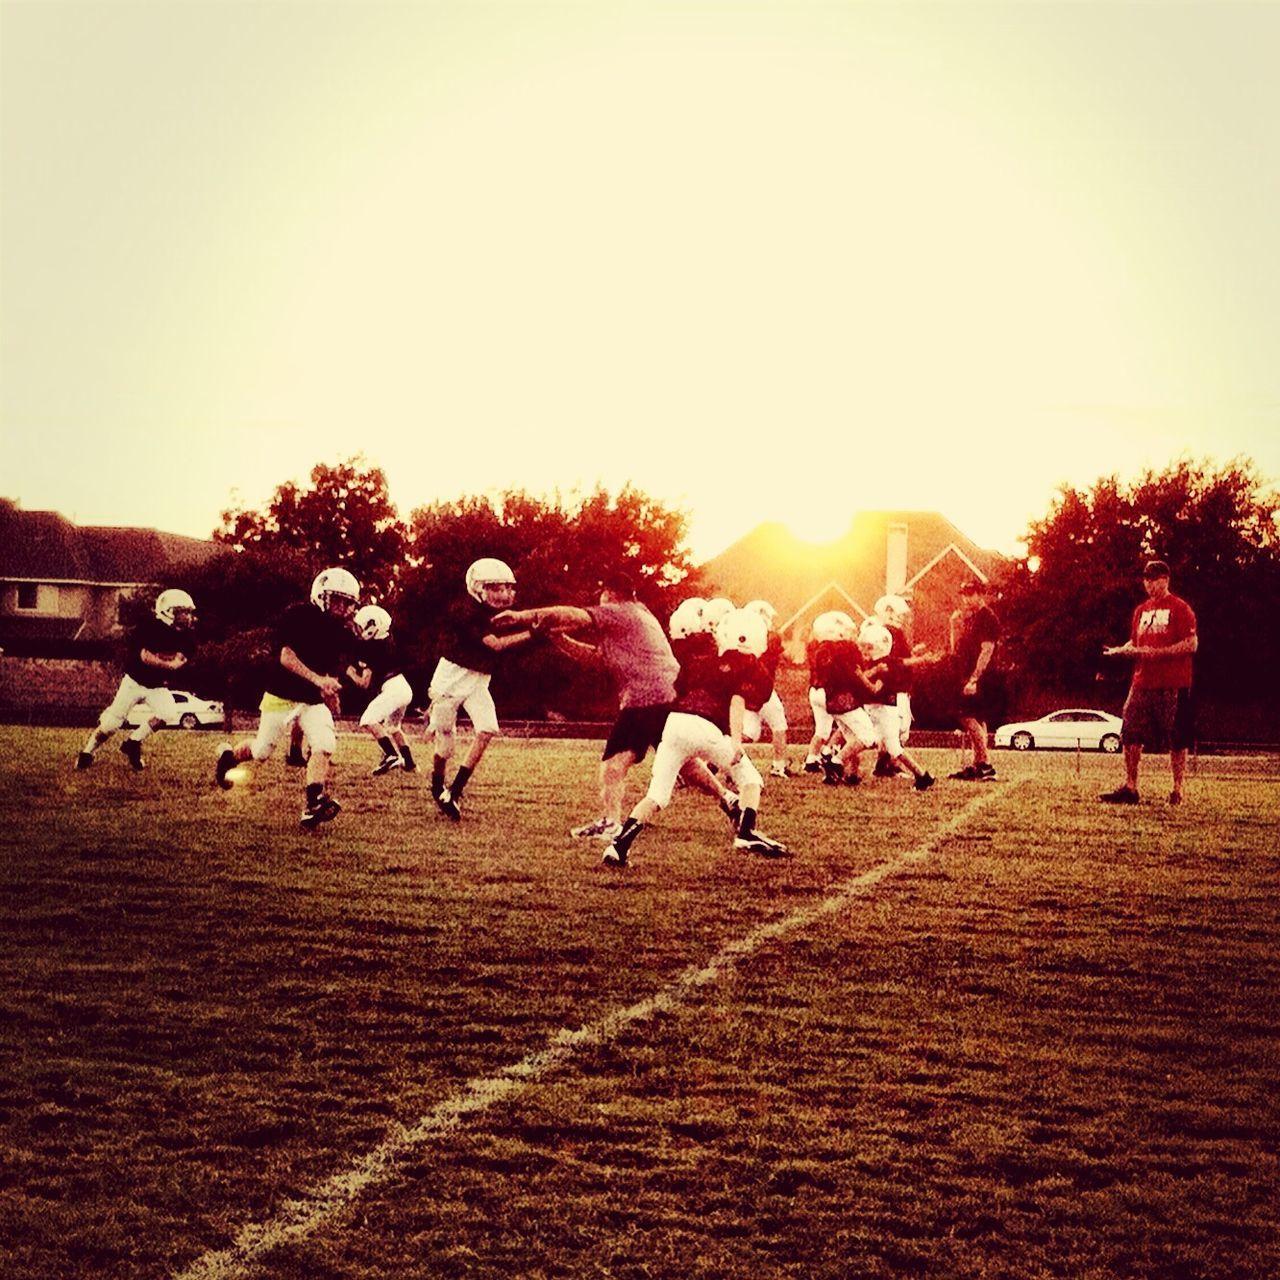 Football Sunset Children Kids